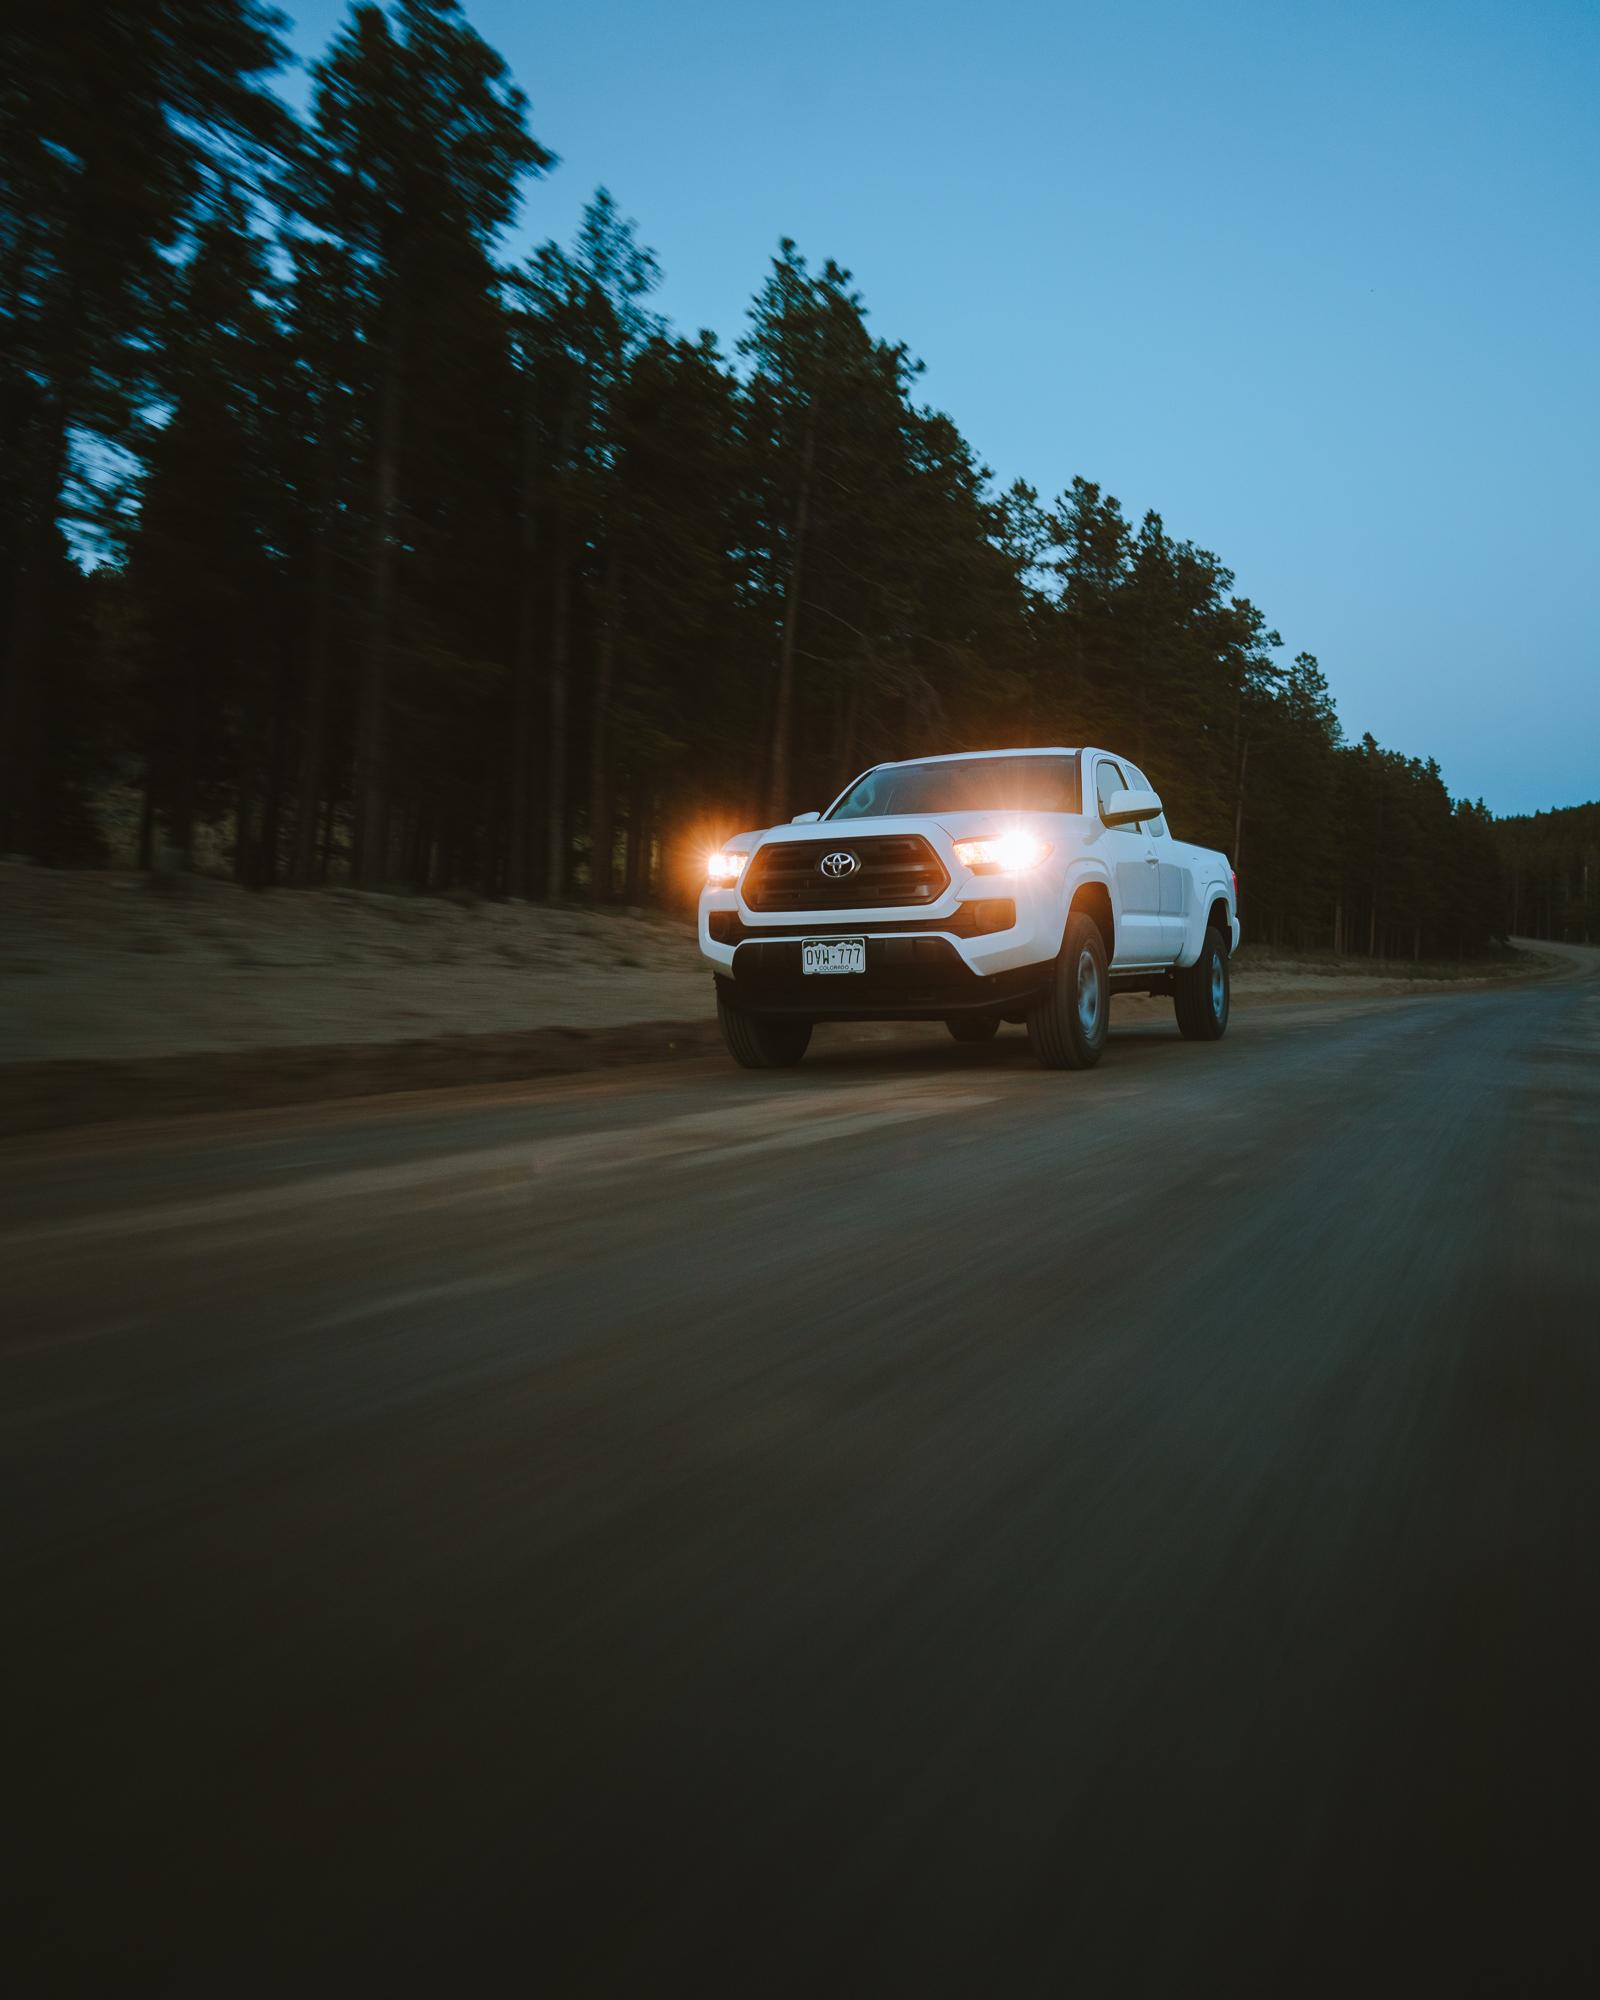 Toyota Tacoma-14.jpg